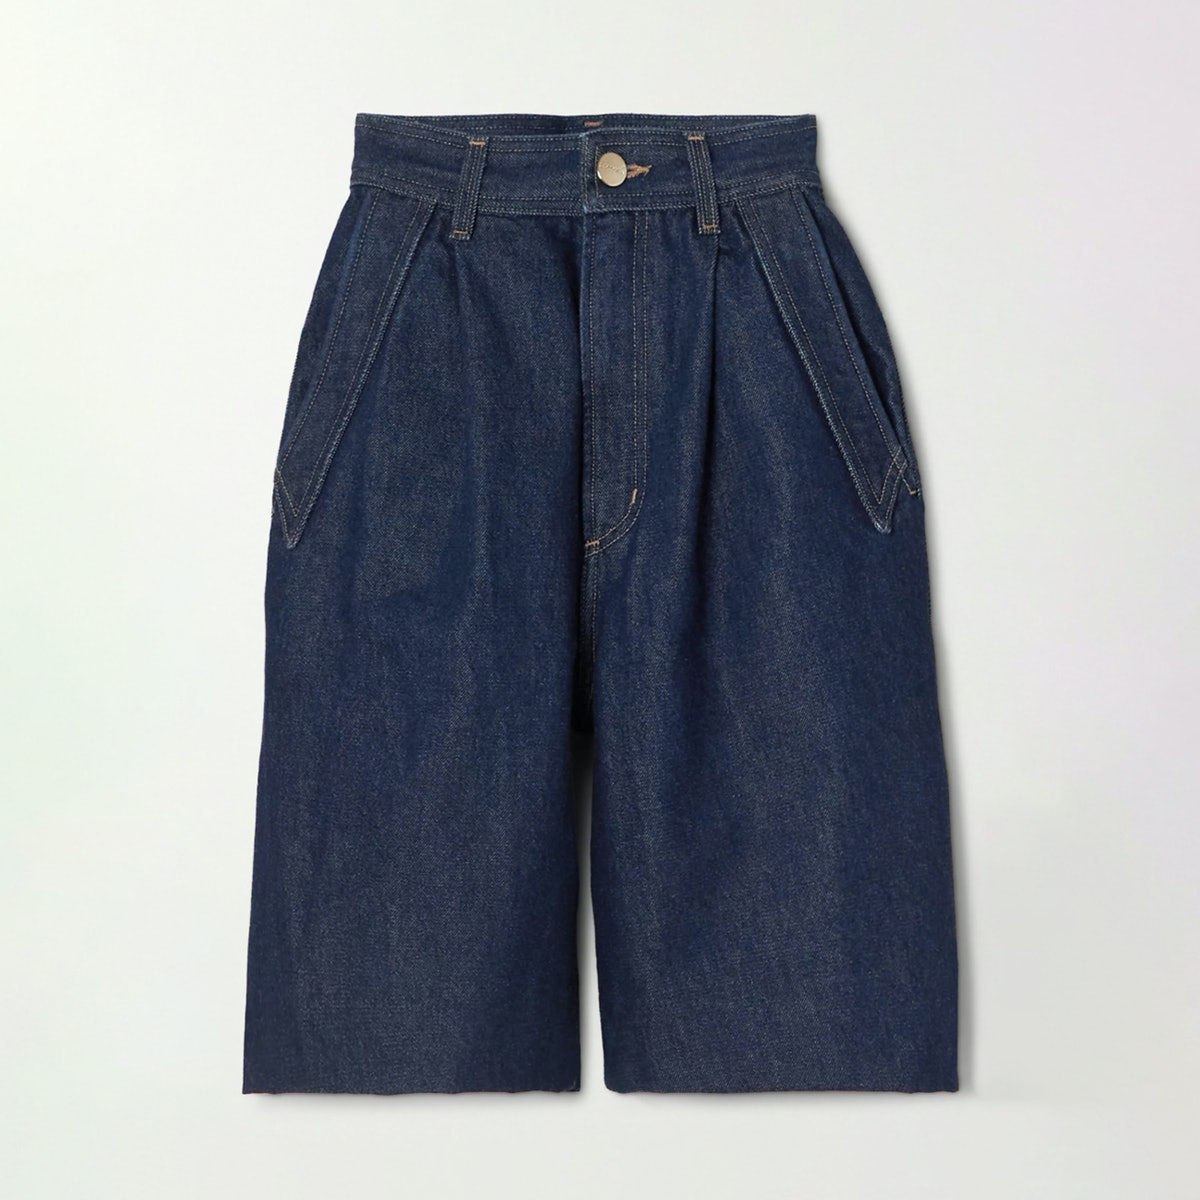 Goldsign Denim Pierced Pocket Pleated Denim Shorts